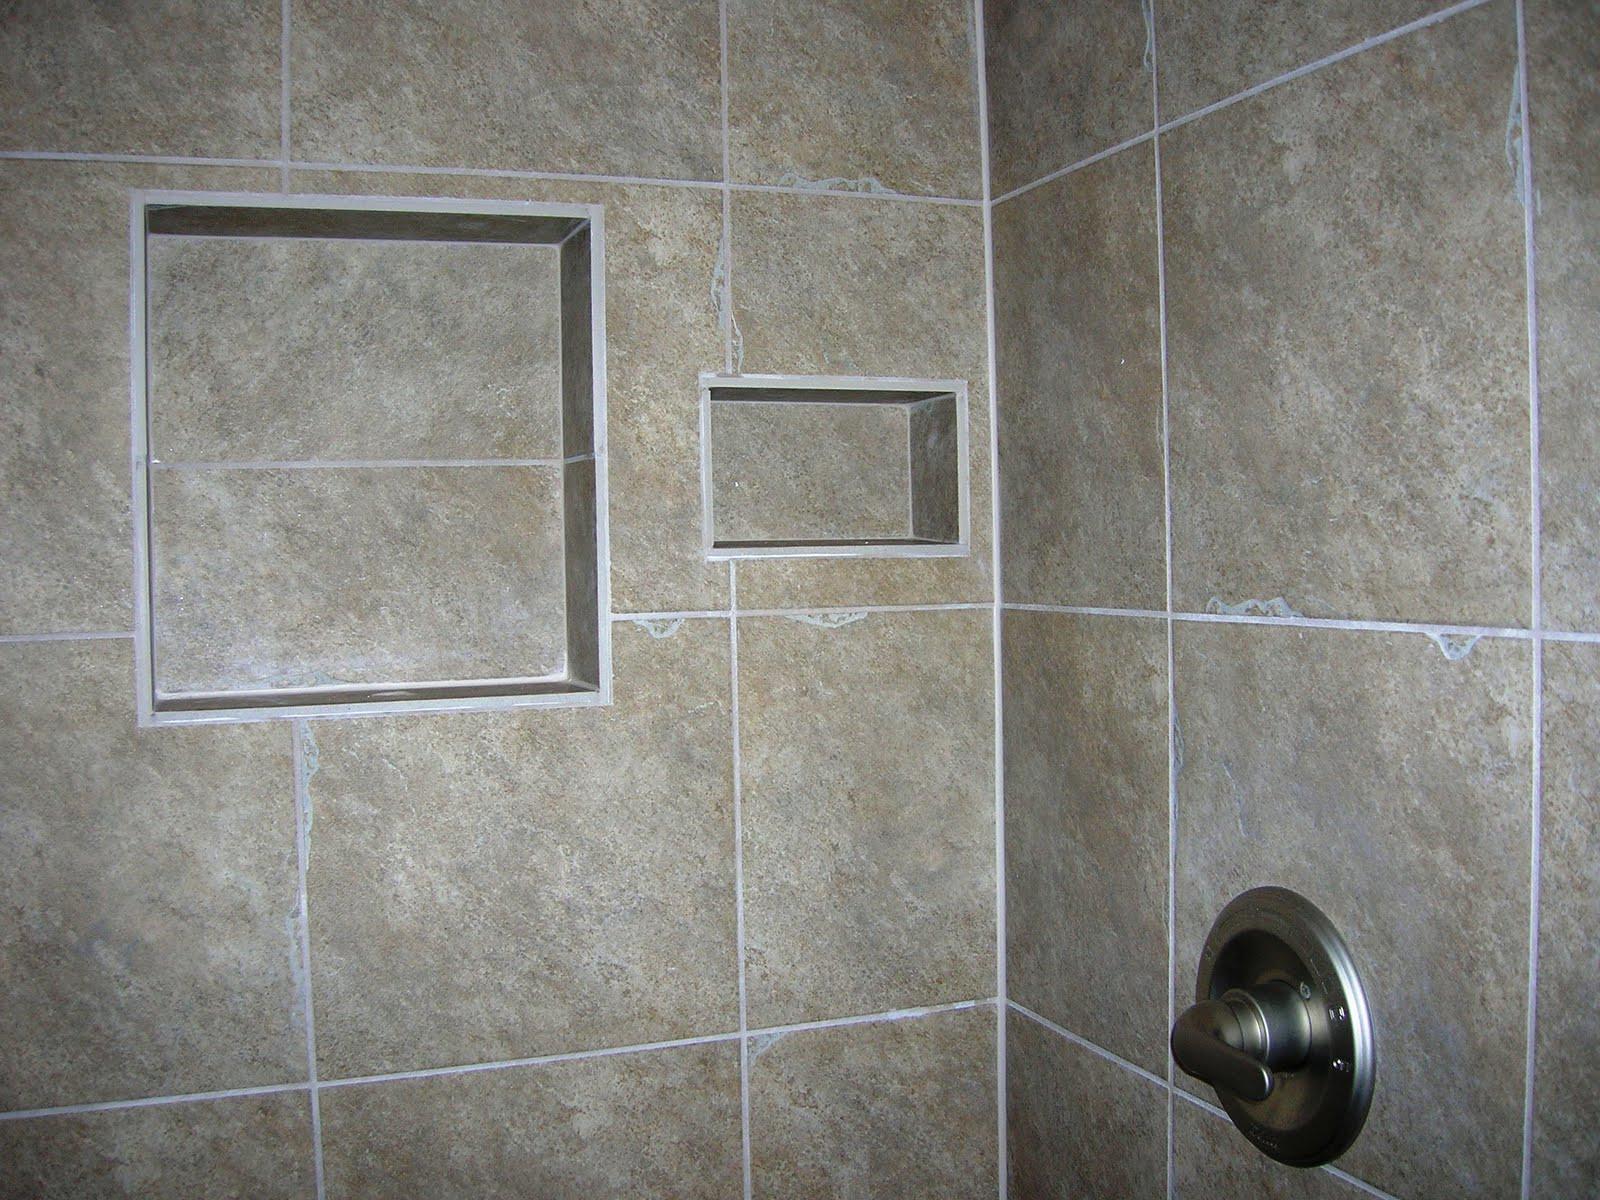 Bathroom Ceramic Floor Tile Ideas  30 nice pictures and ideas of modern bathroom wall tile